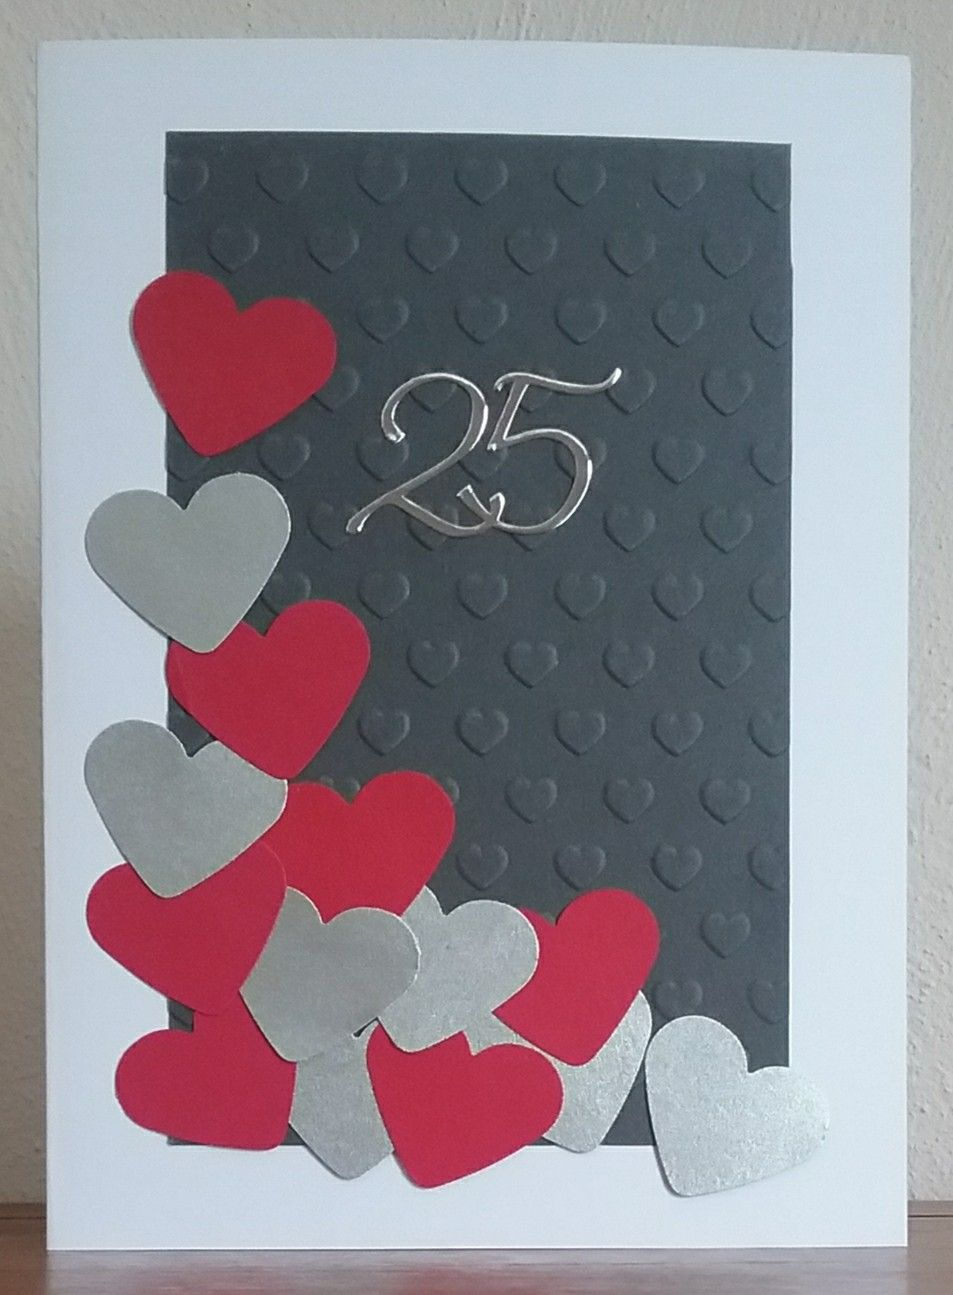 Pin By Kristine Steenbock On Wedding Anniversary Cards Ideas Cards Handmade Greeting Cards Handmade Cards